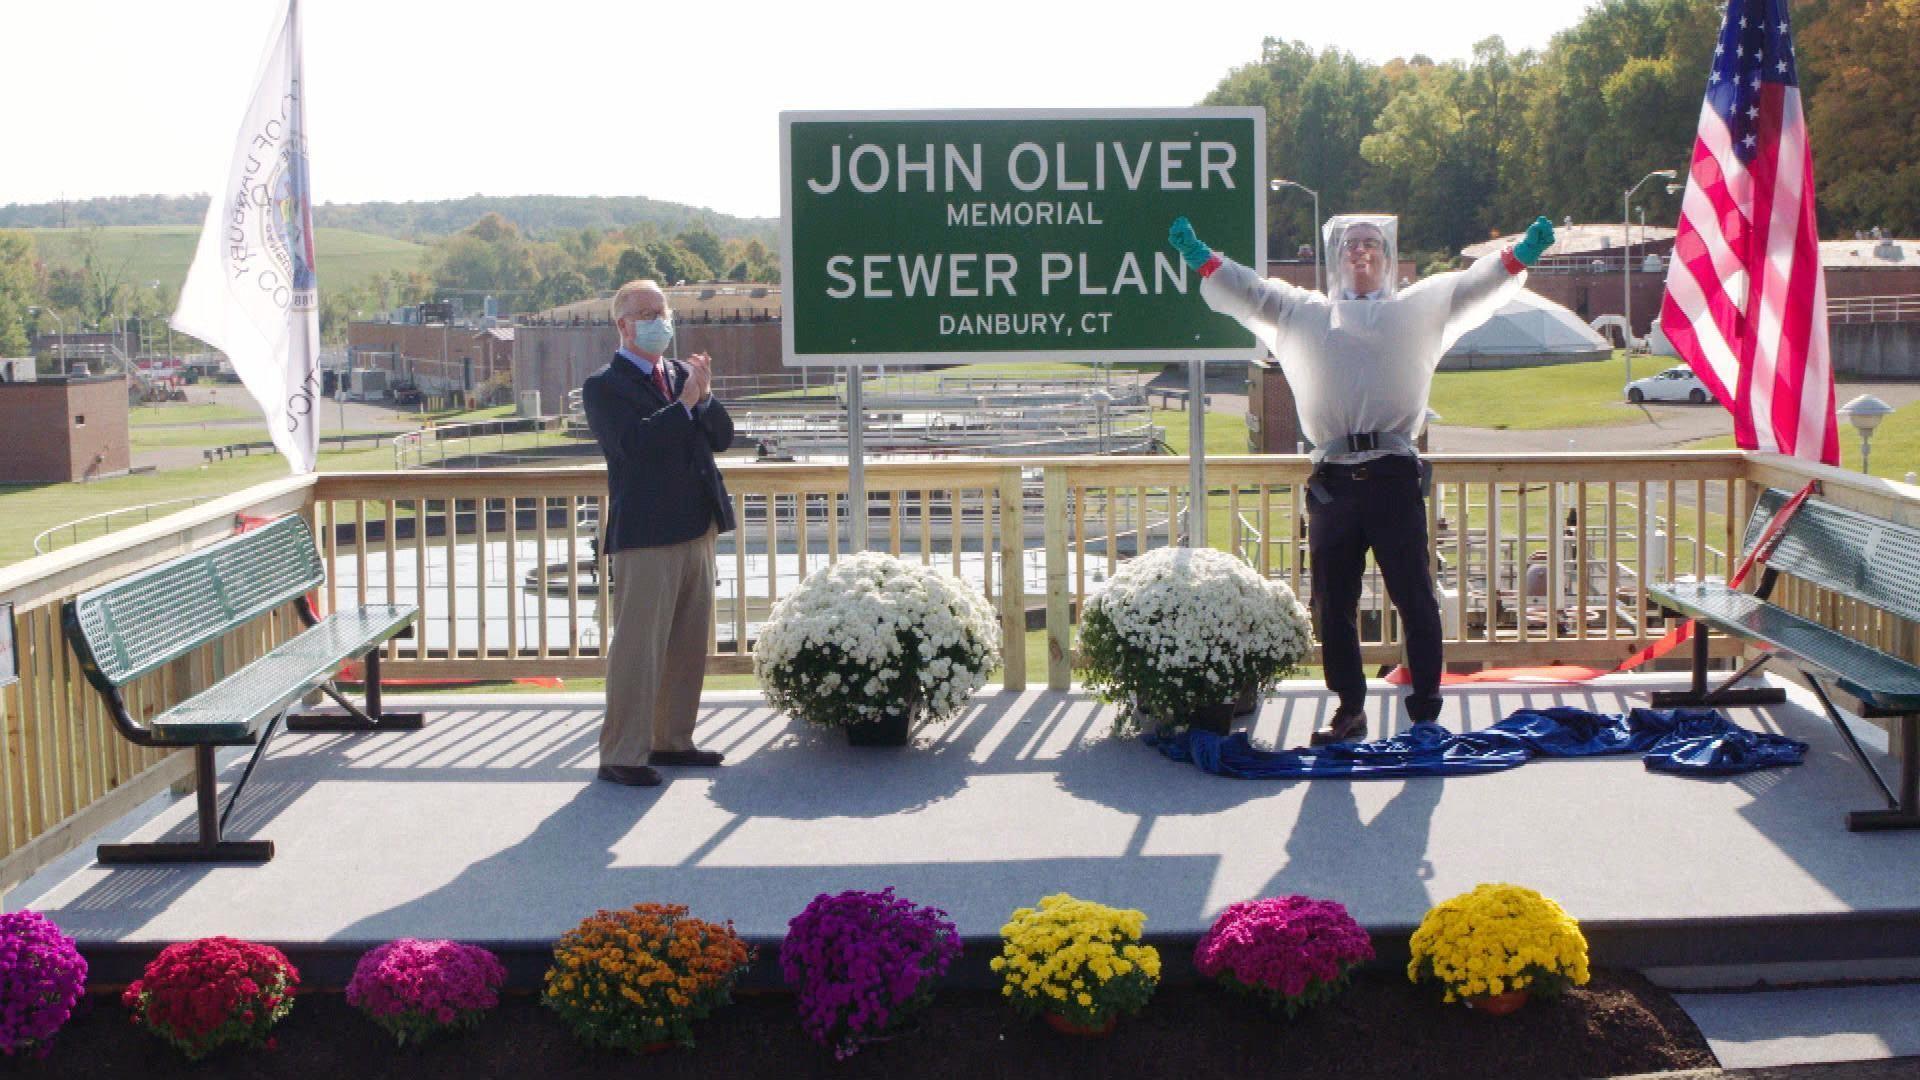 John Oliver visits Danbury sewage plant named in his honor